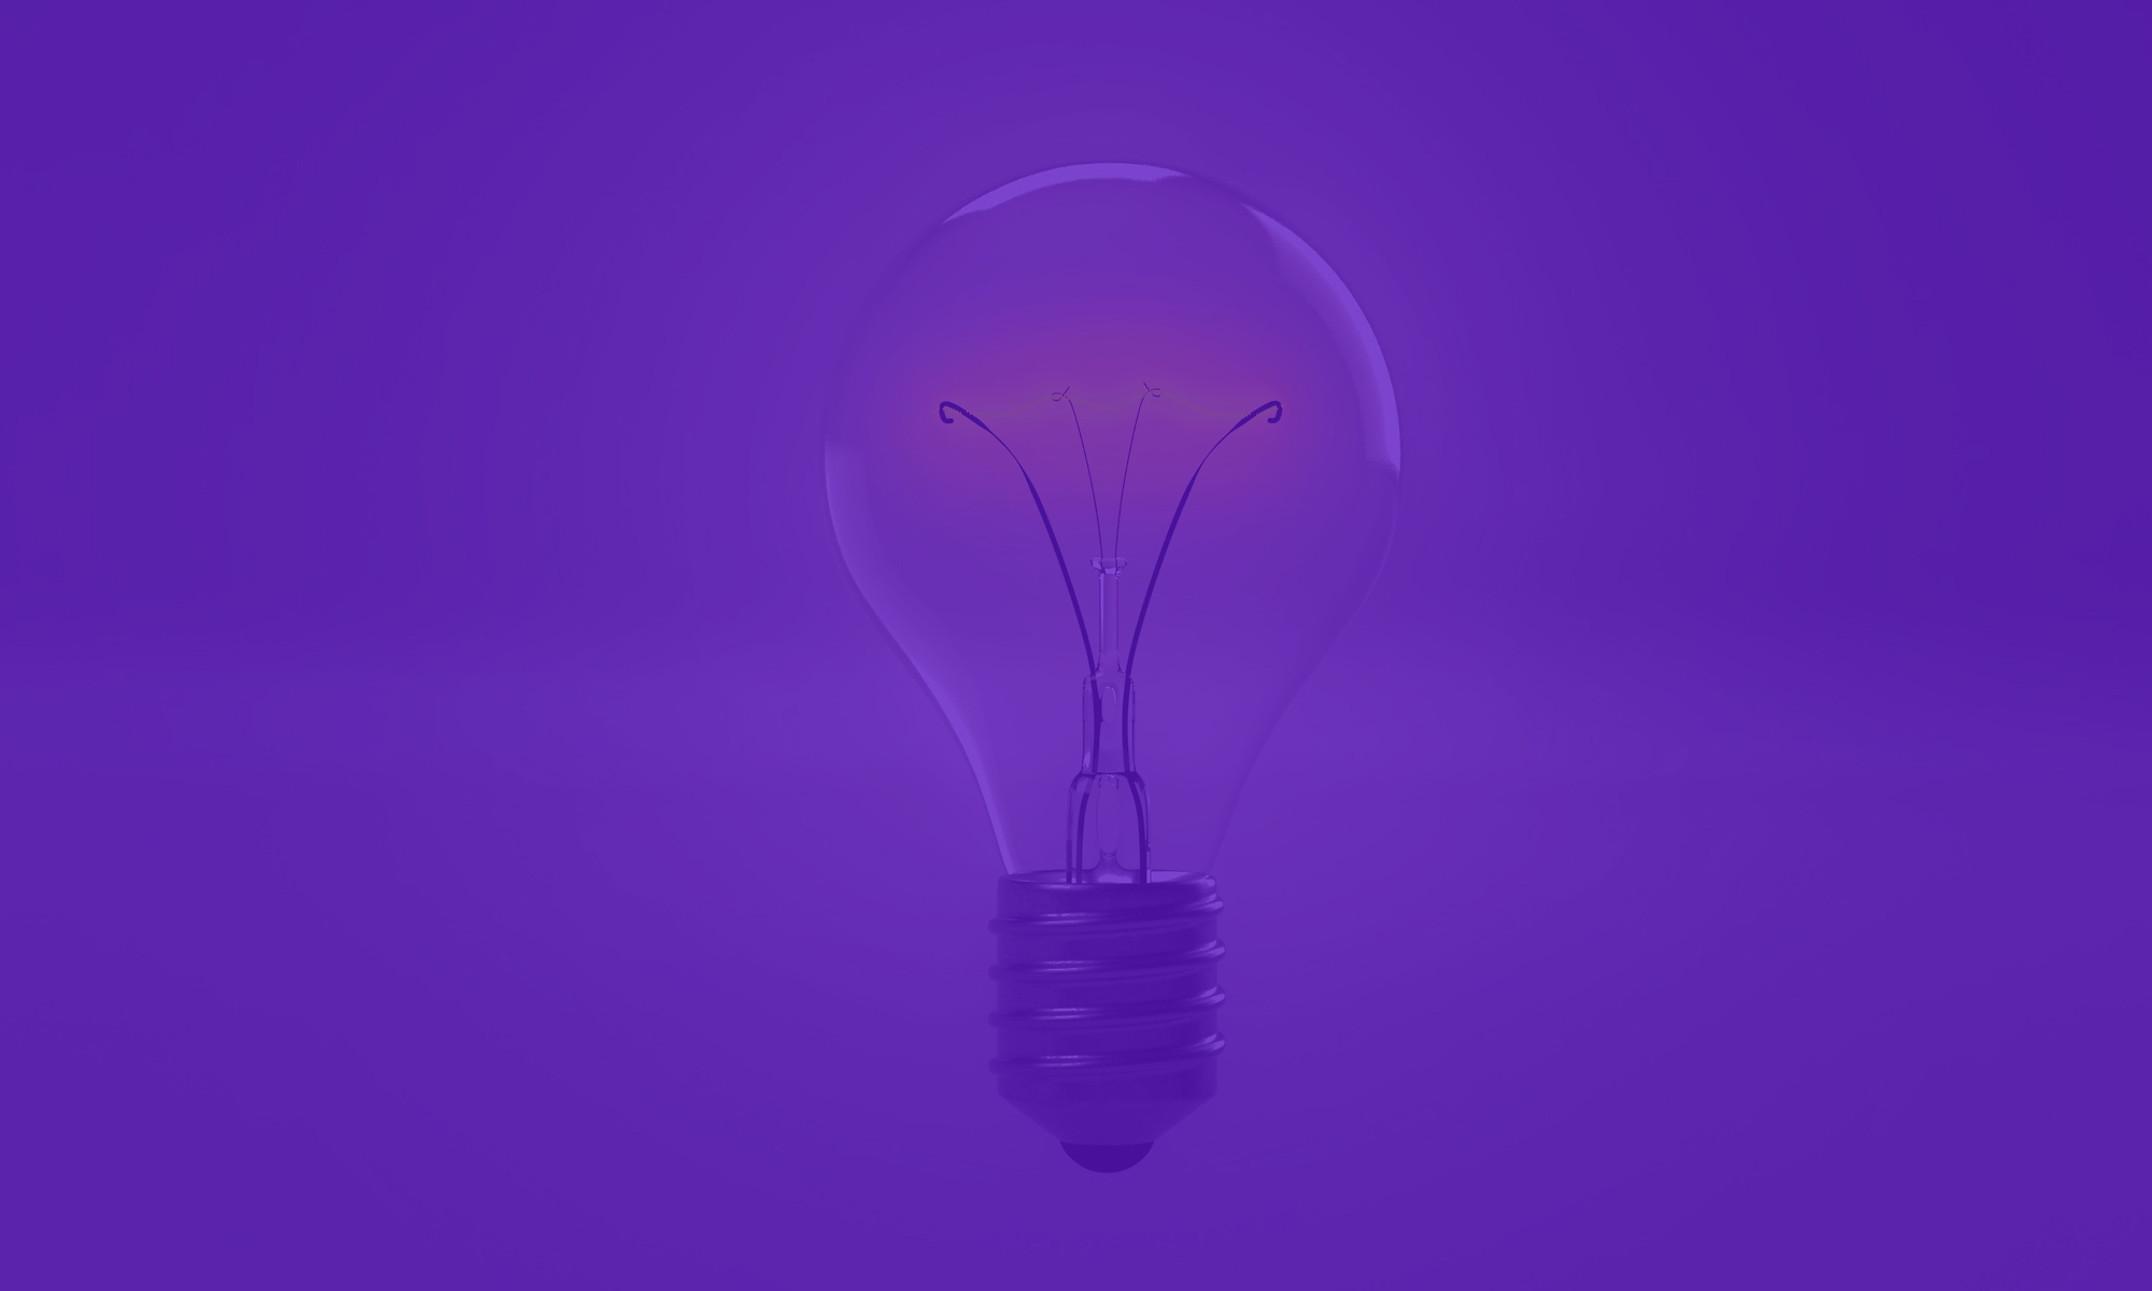 lightbulb-1875247_edited_edited.jpg